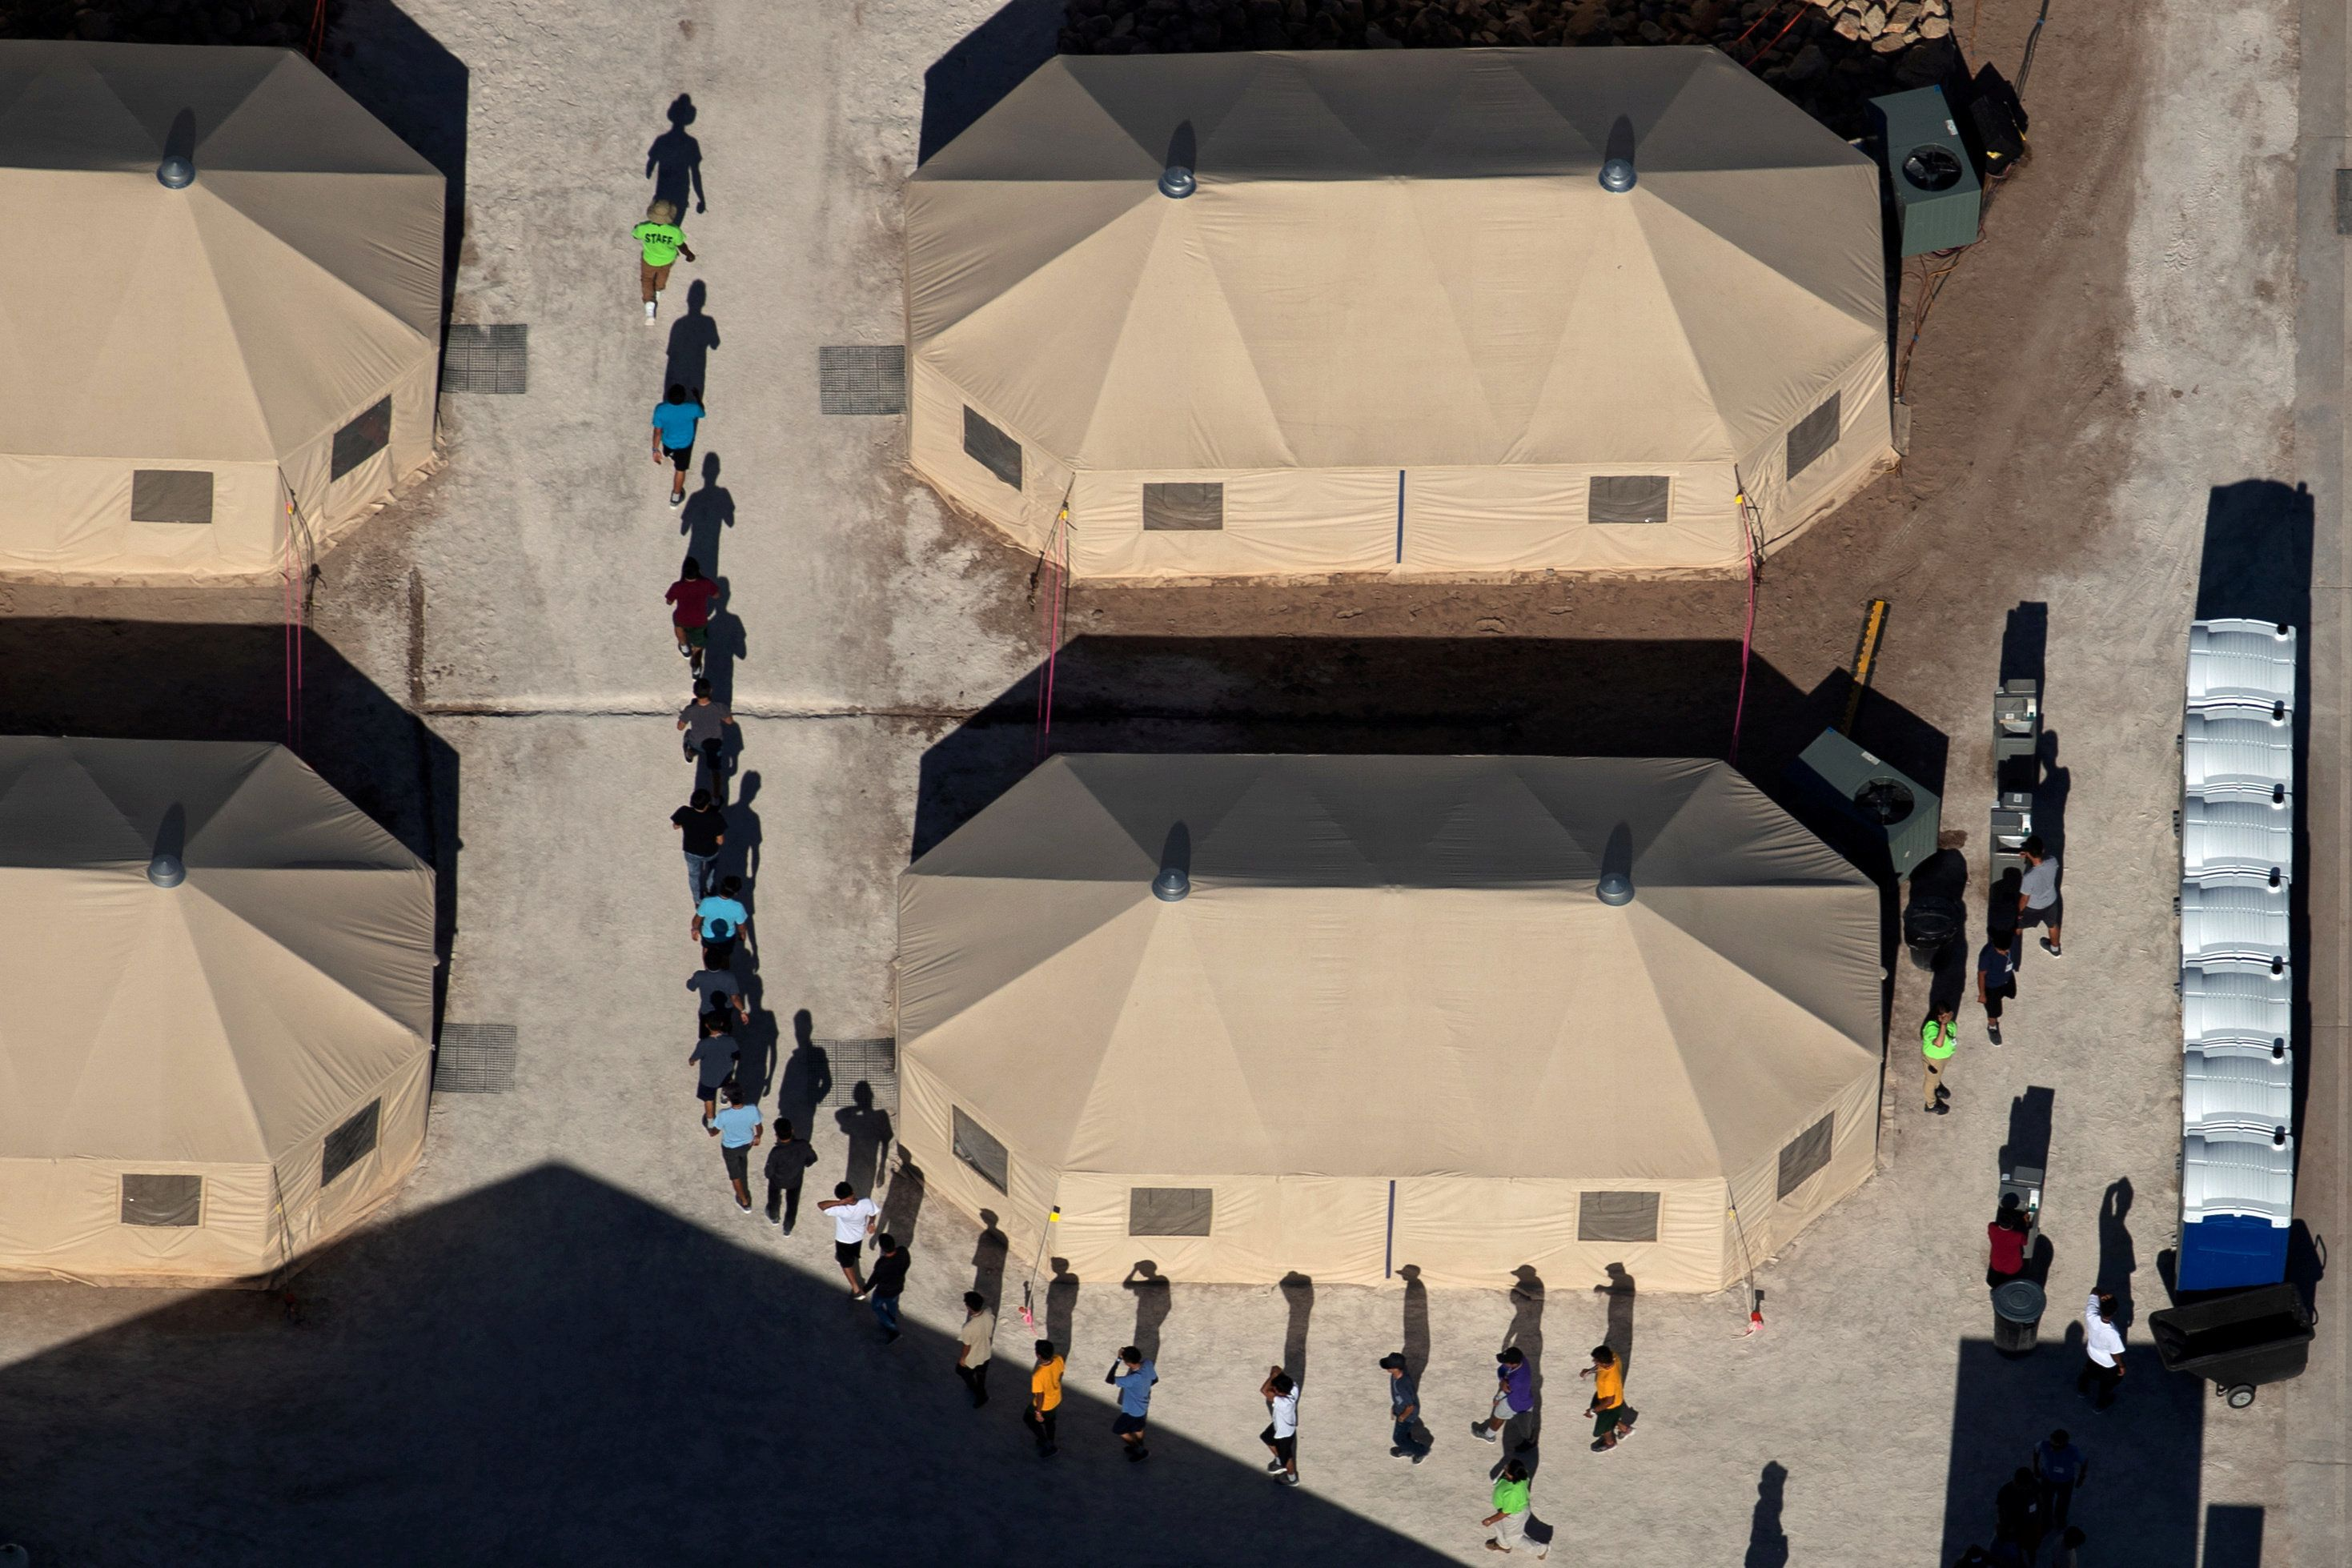 Immigrant children at a detention facility in Tornillo, Texas, near the U.S.-Mexico border, June 18. Thousands of children ha